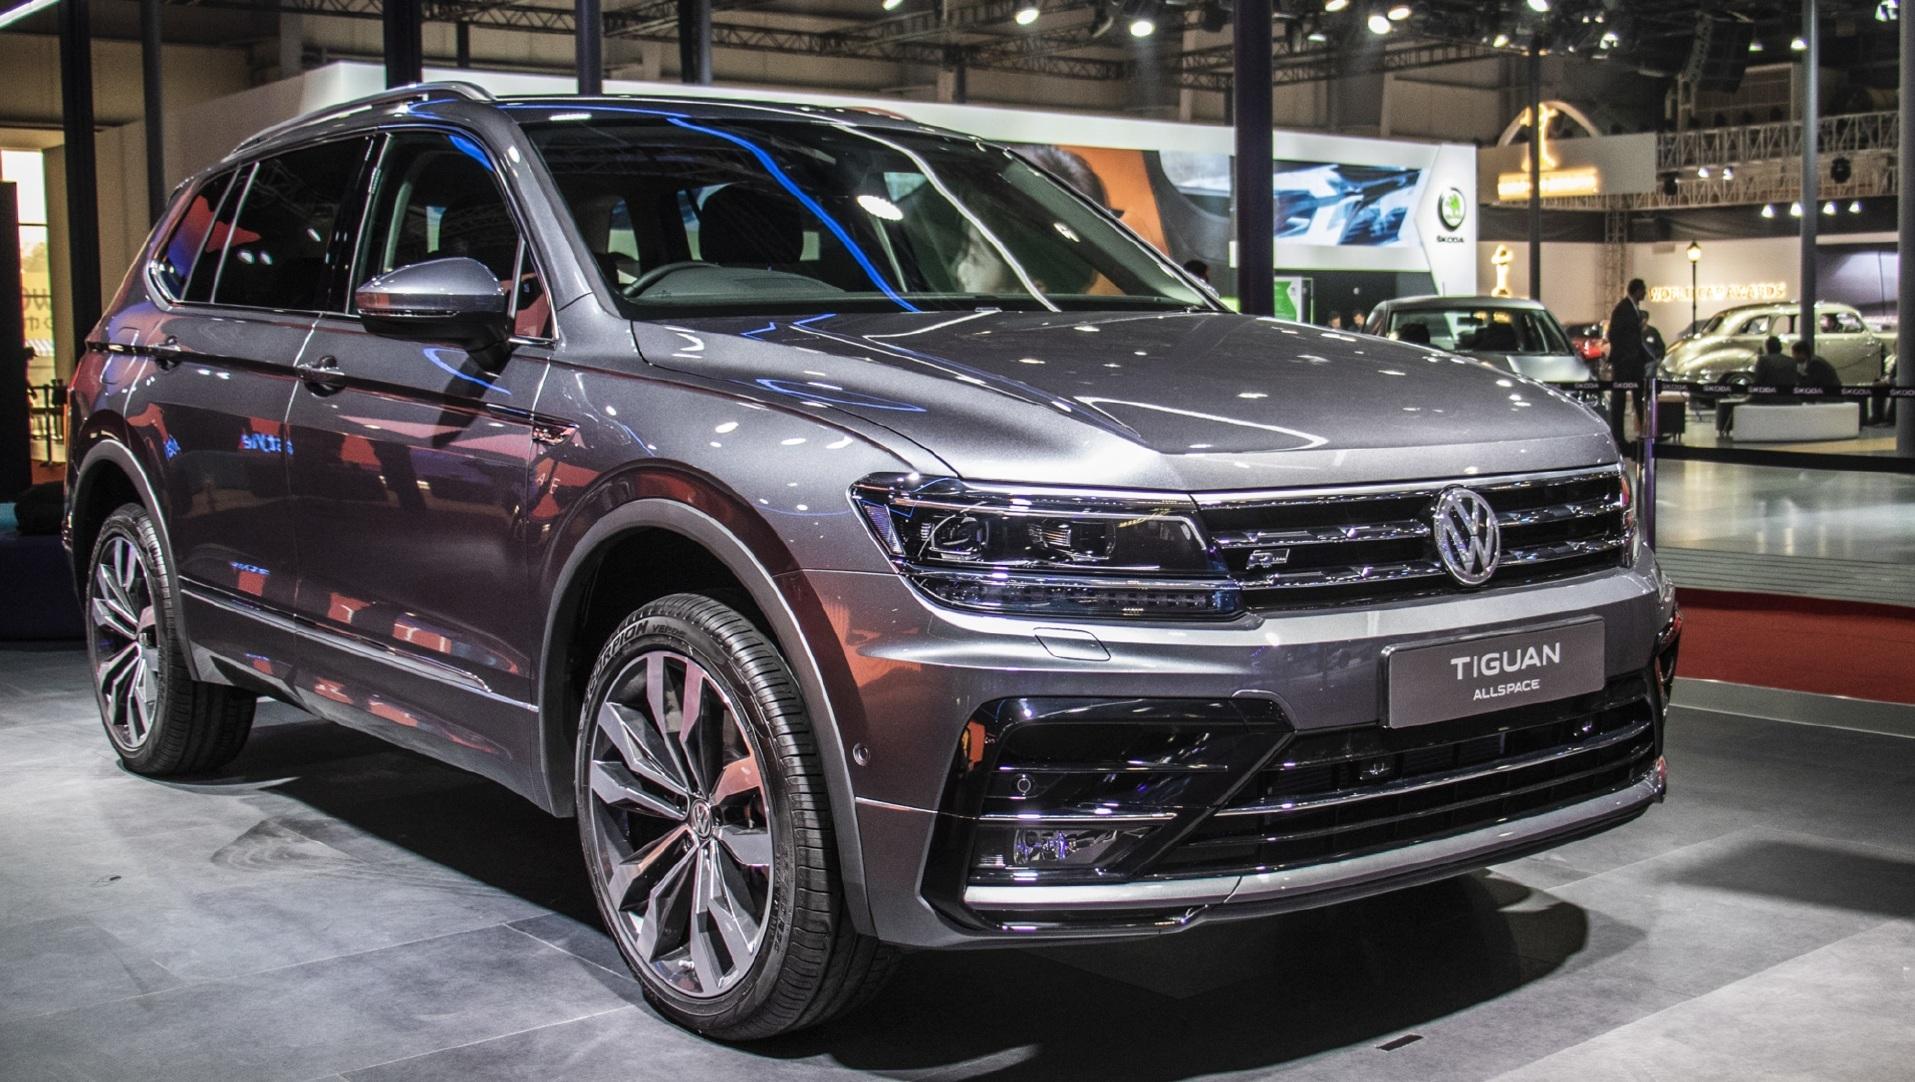 Volkswagen Tiguan All Space Top Five Full Size SUVs